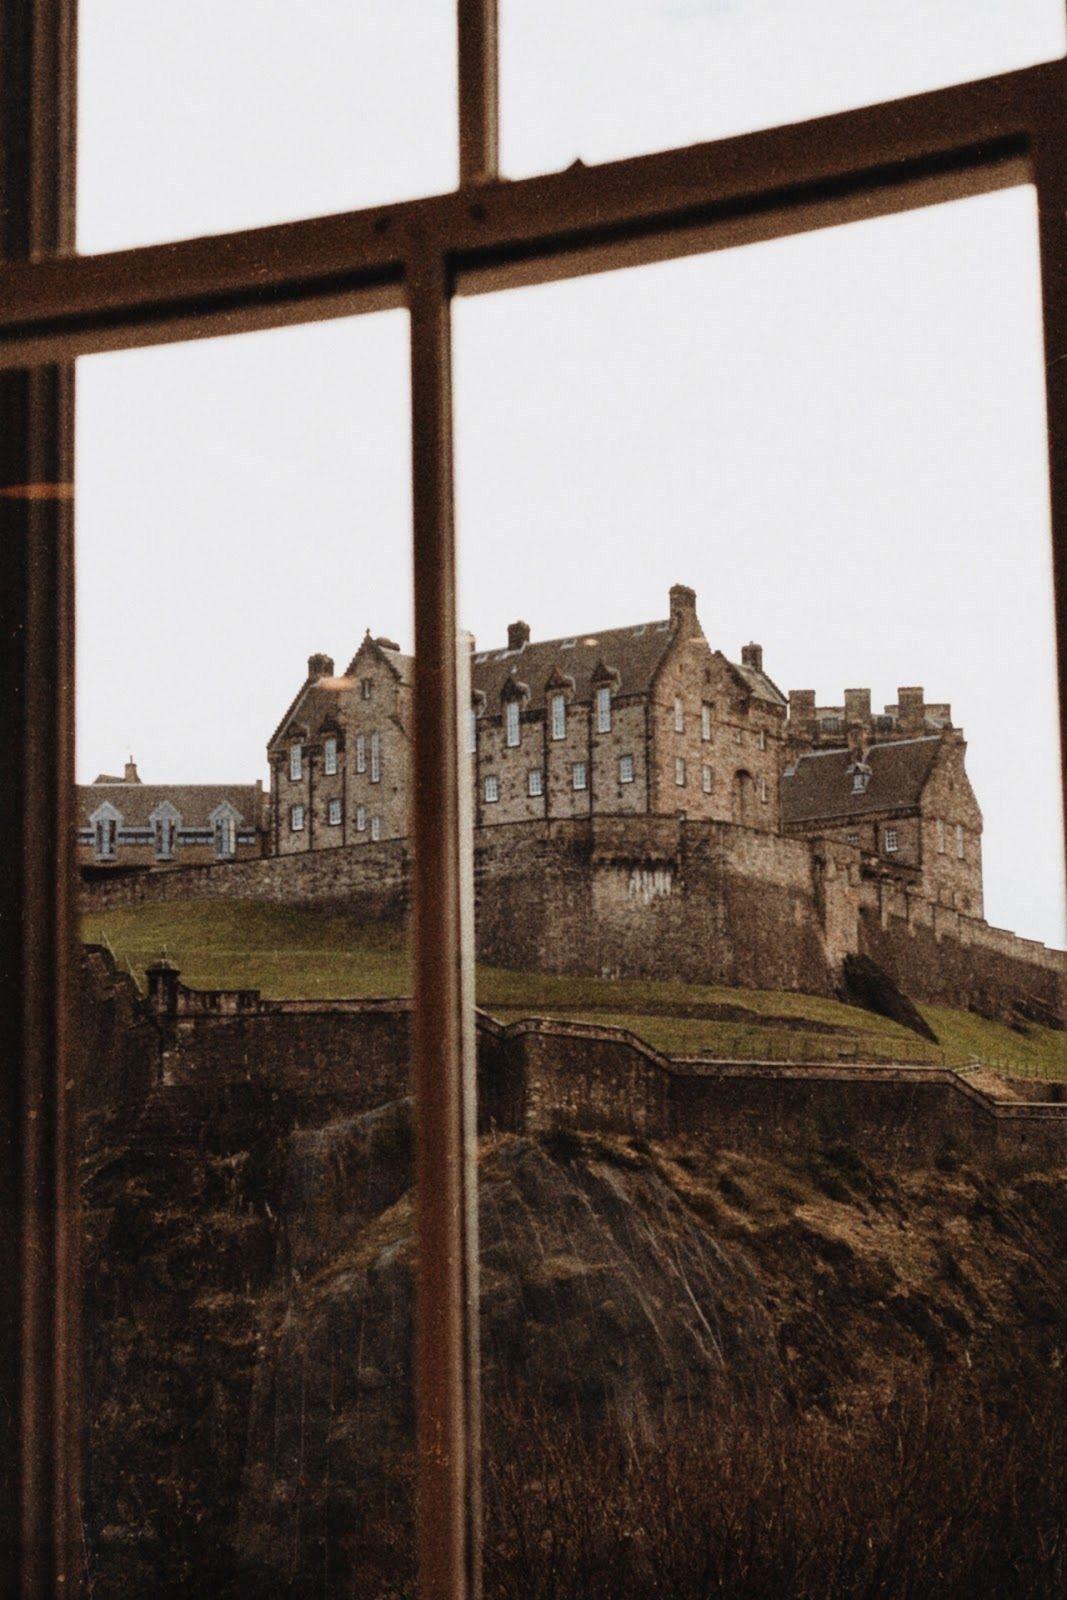 Kaydedilmis Fotograflar In 2020 Dark Aesthetic Slytherin Aesthetic Places To Visit